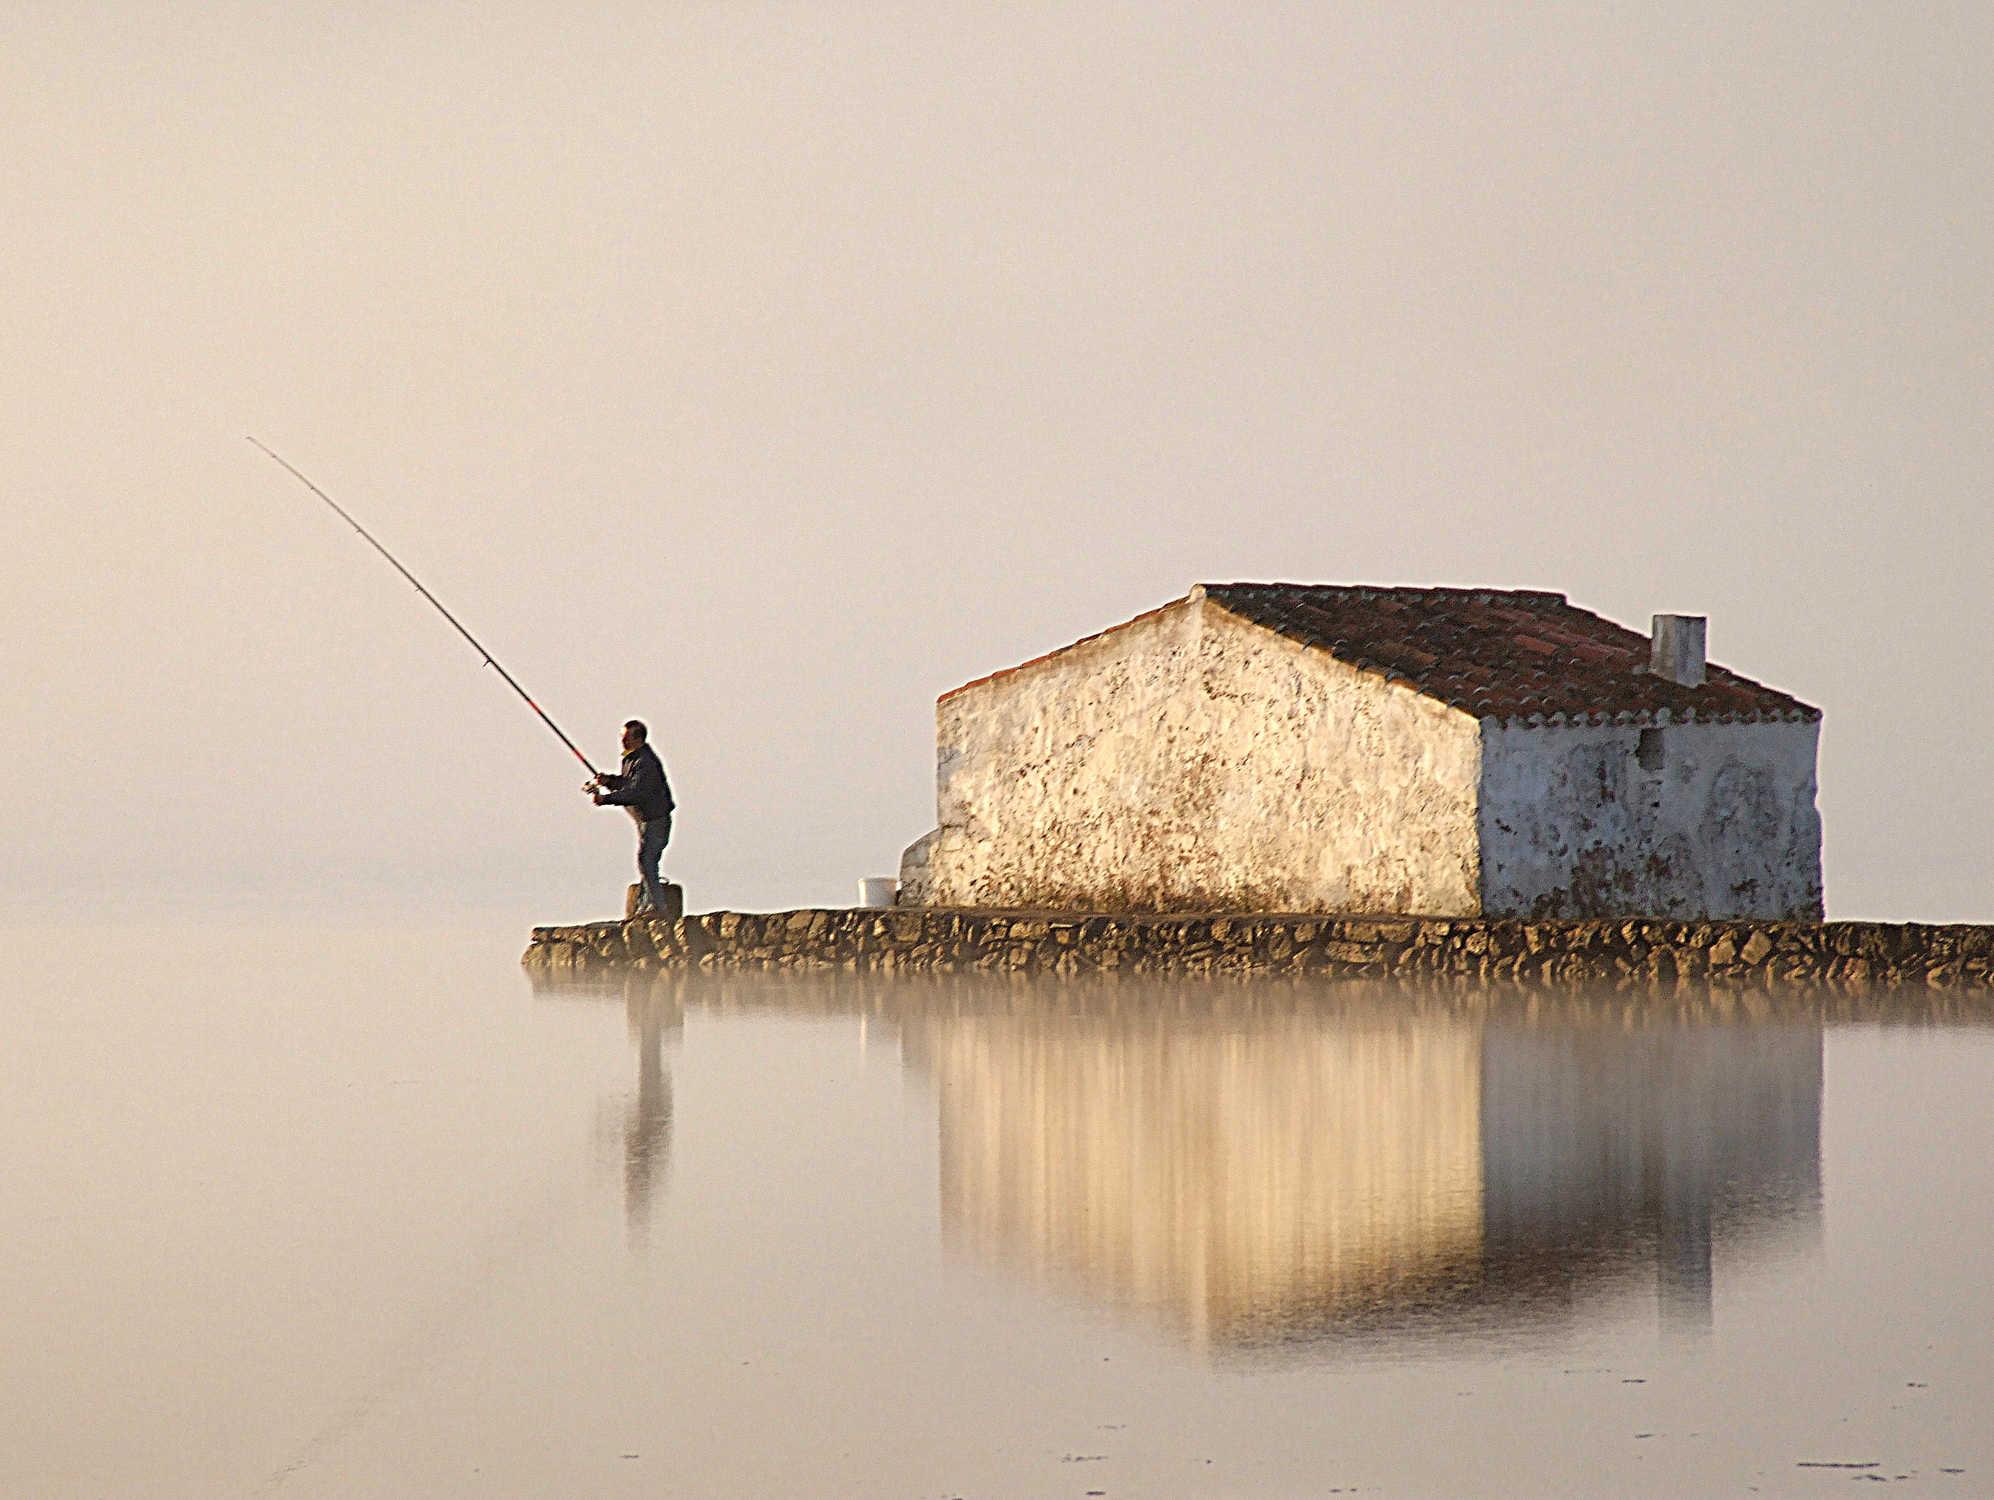 Pescant dins la badia de Fornells - 125 ways to enjoy Menorca